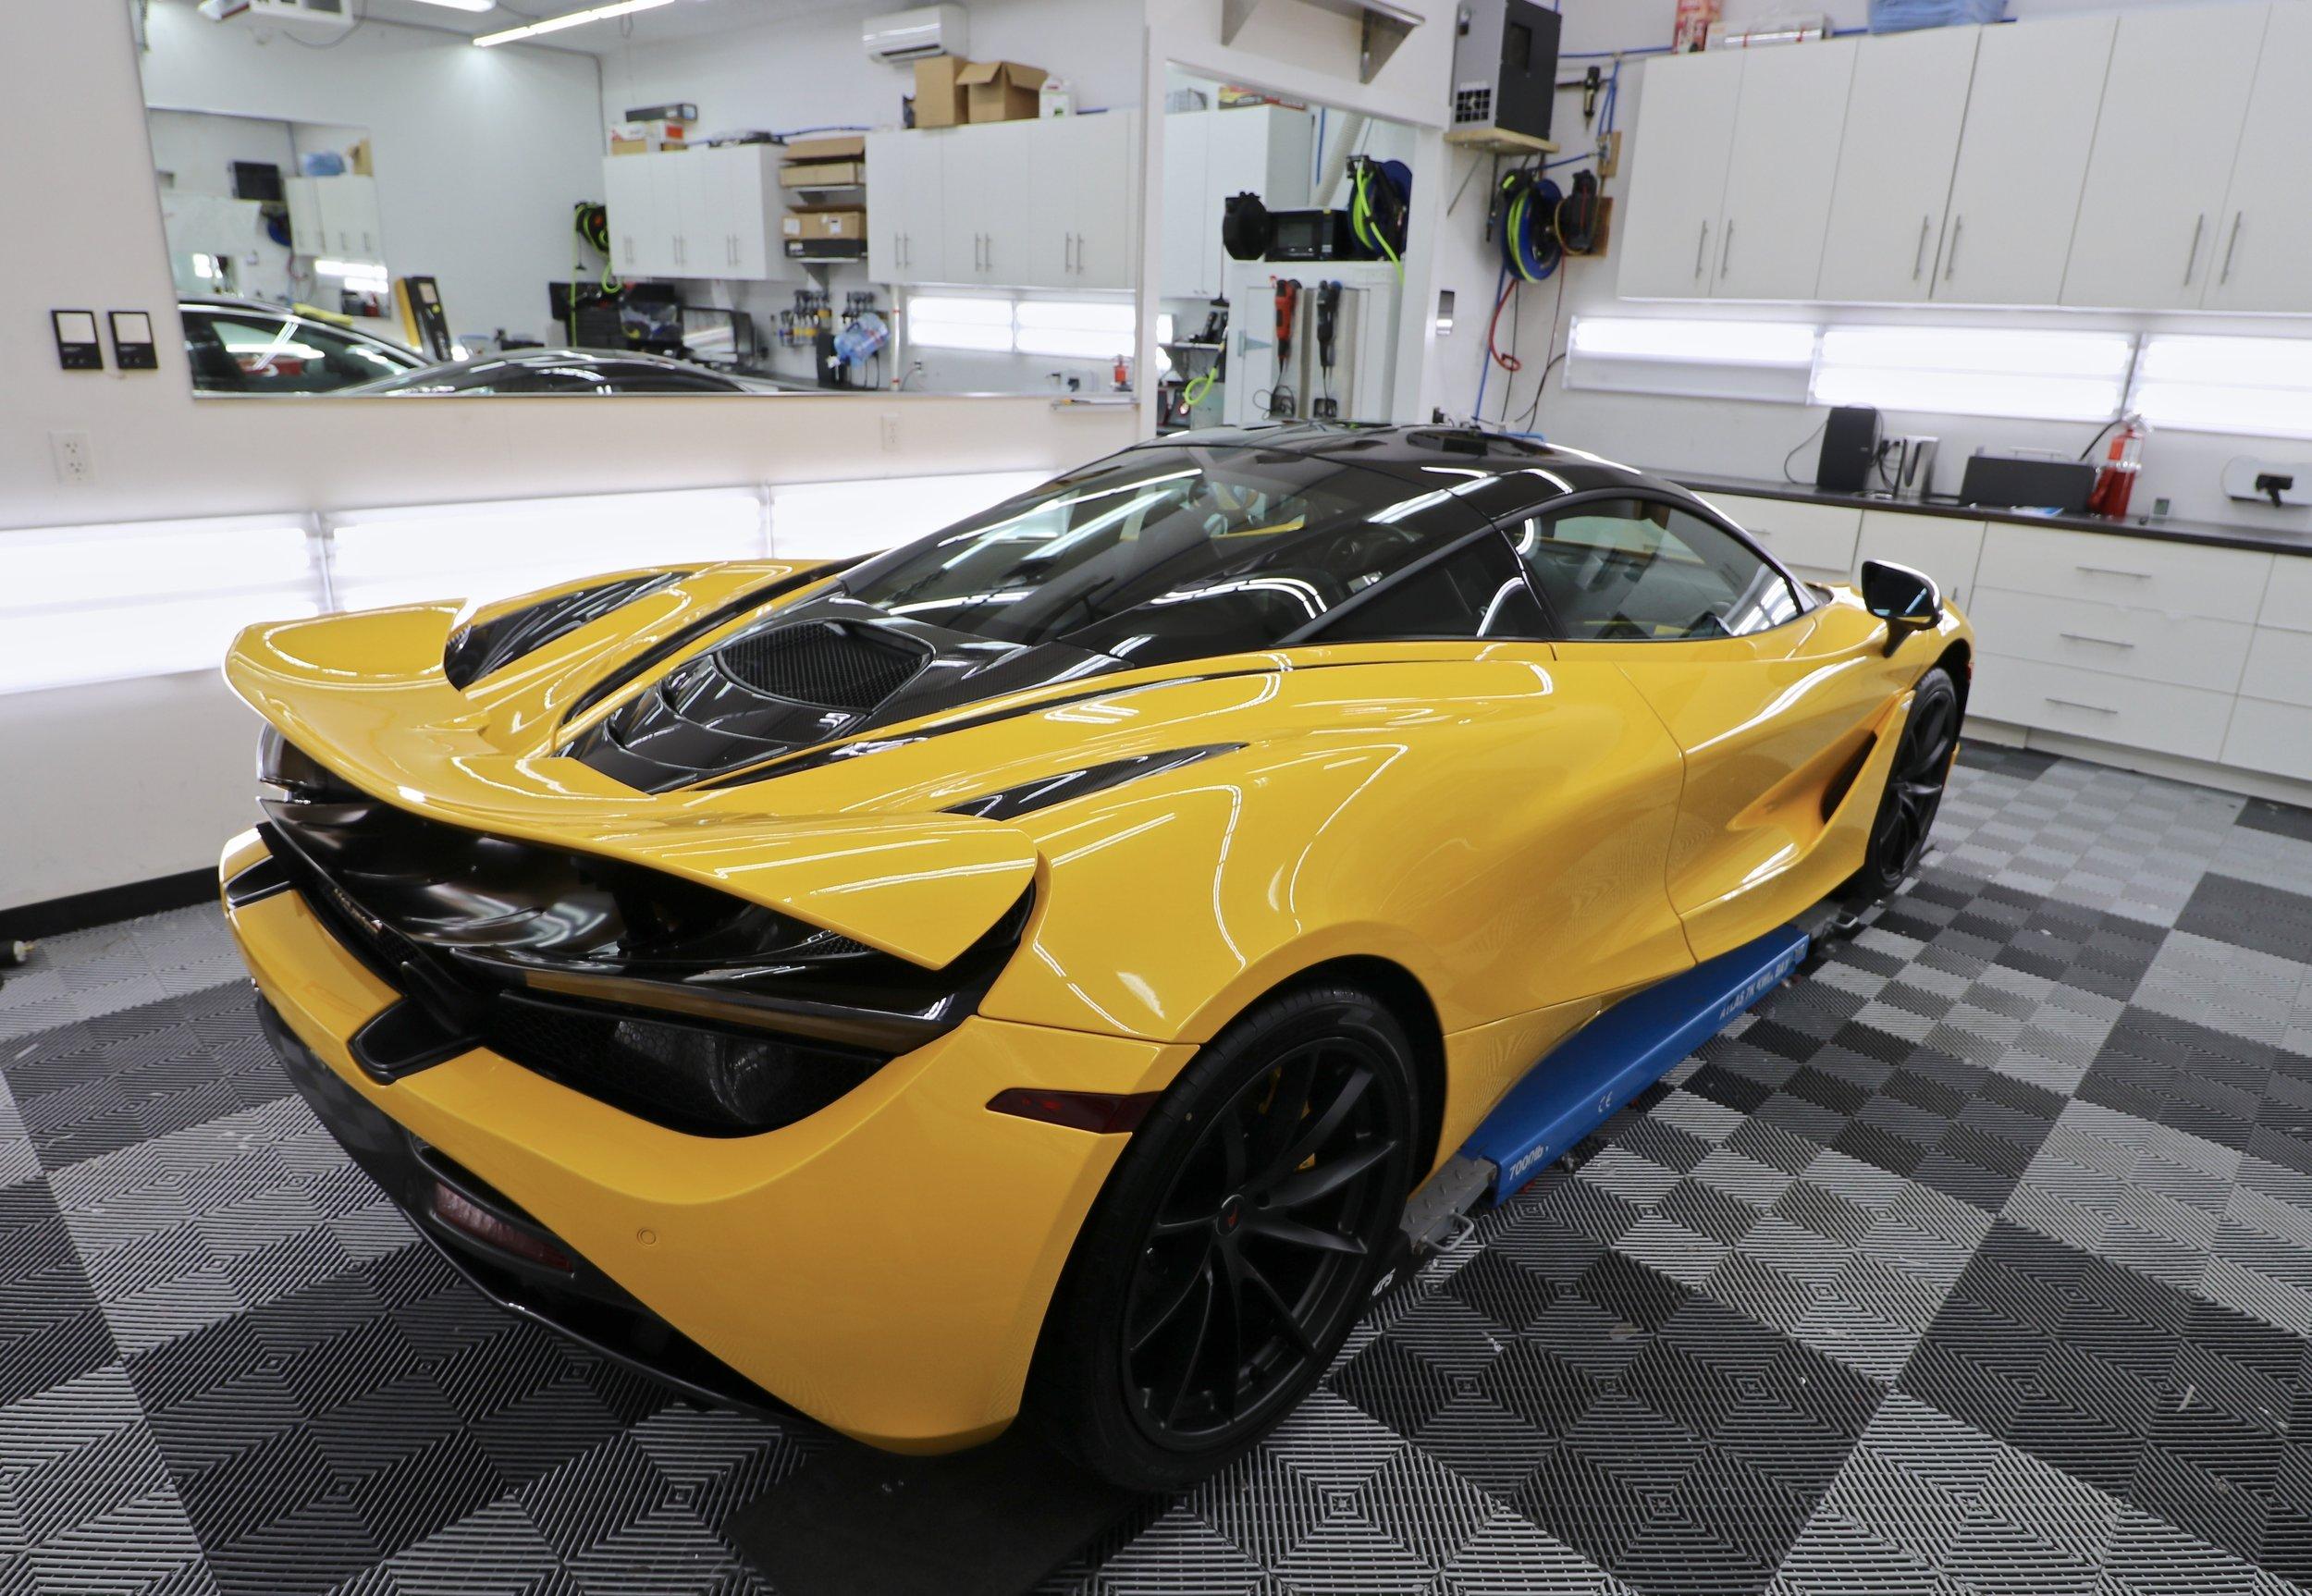 Quality Focused Car Care    Paint Protection Film   CQuartz Coatings   Mobile Auto Detailing